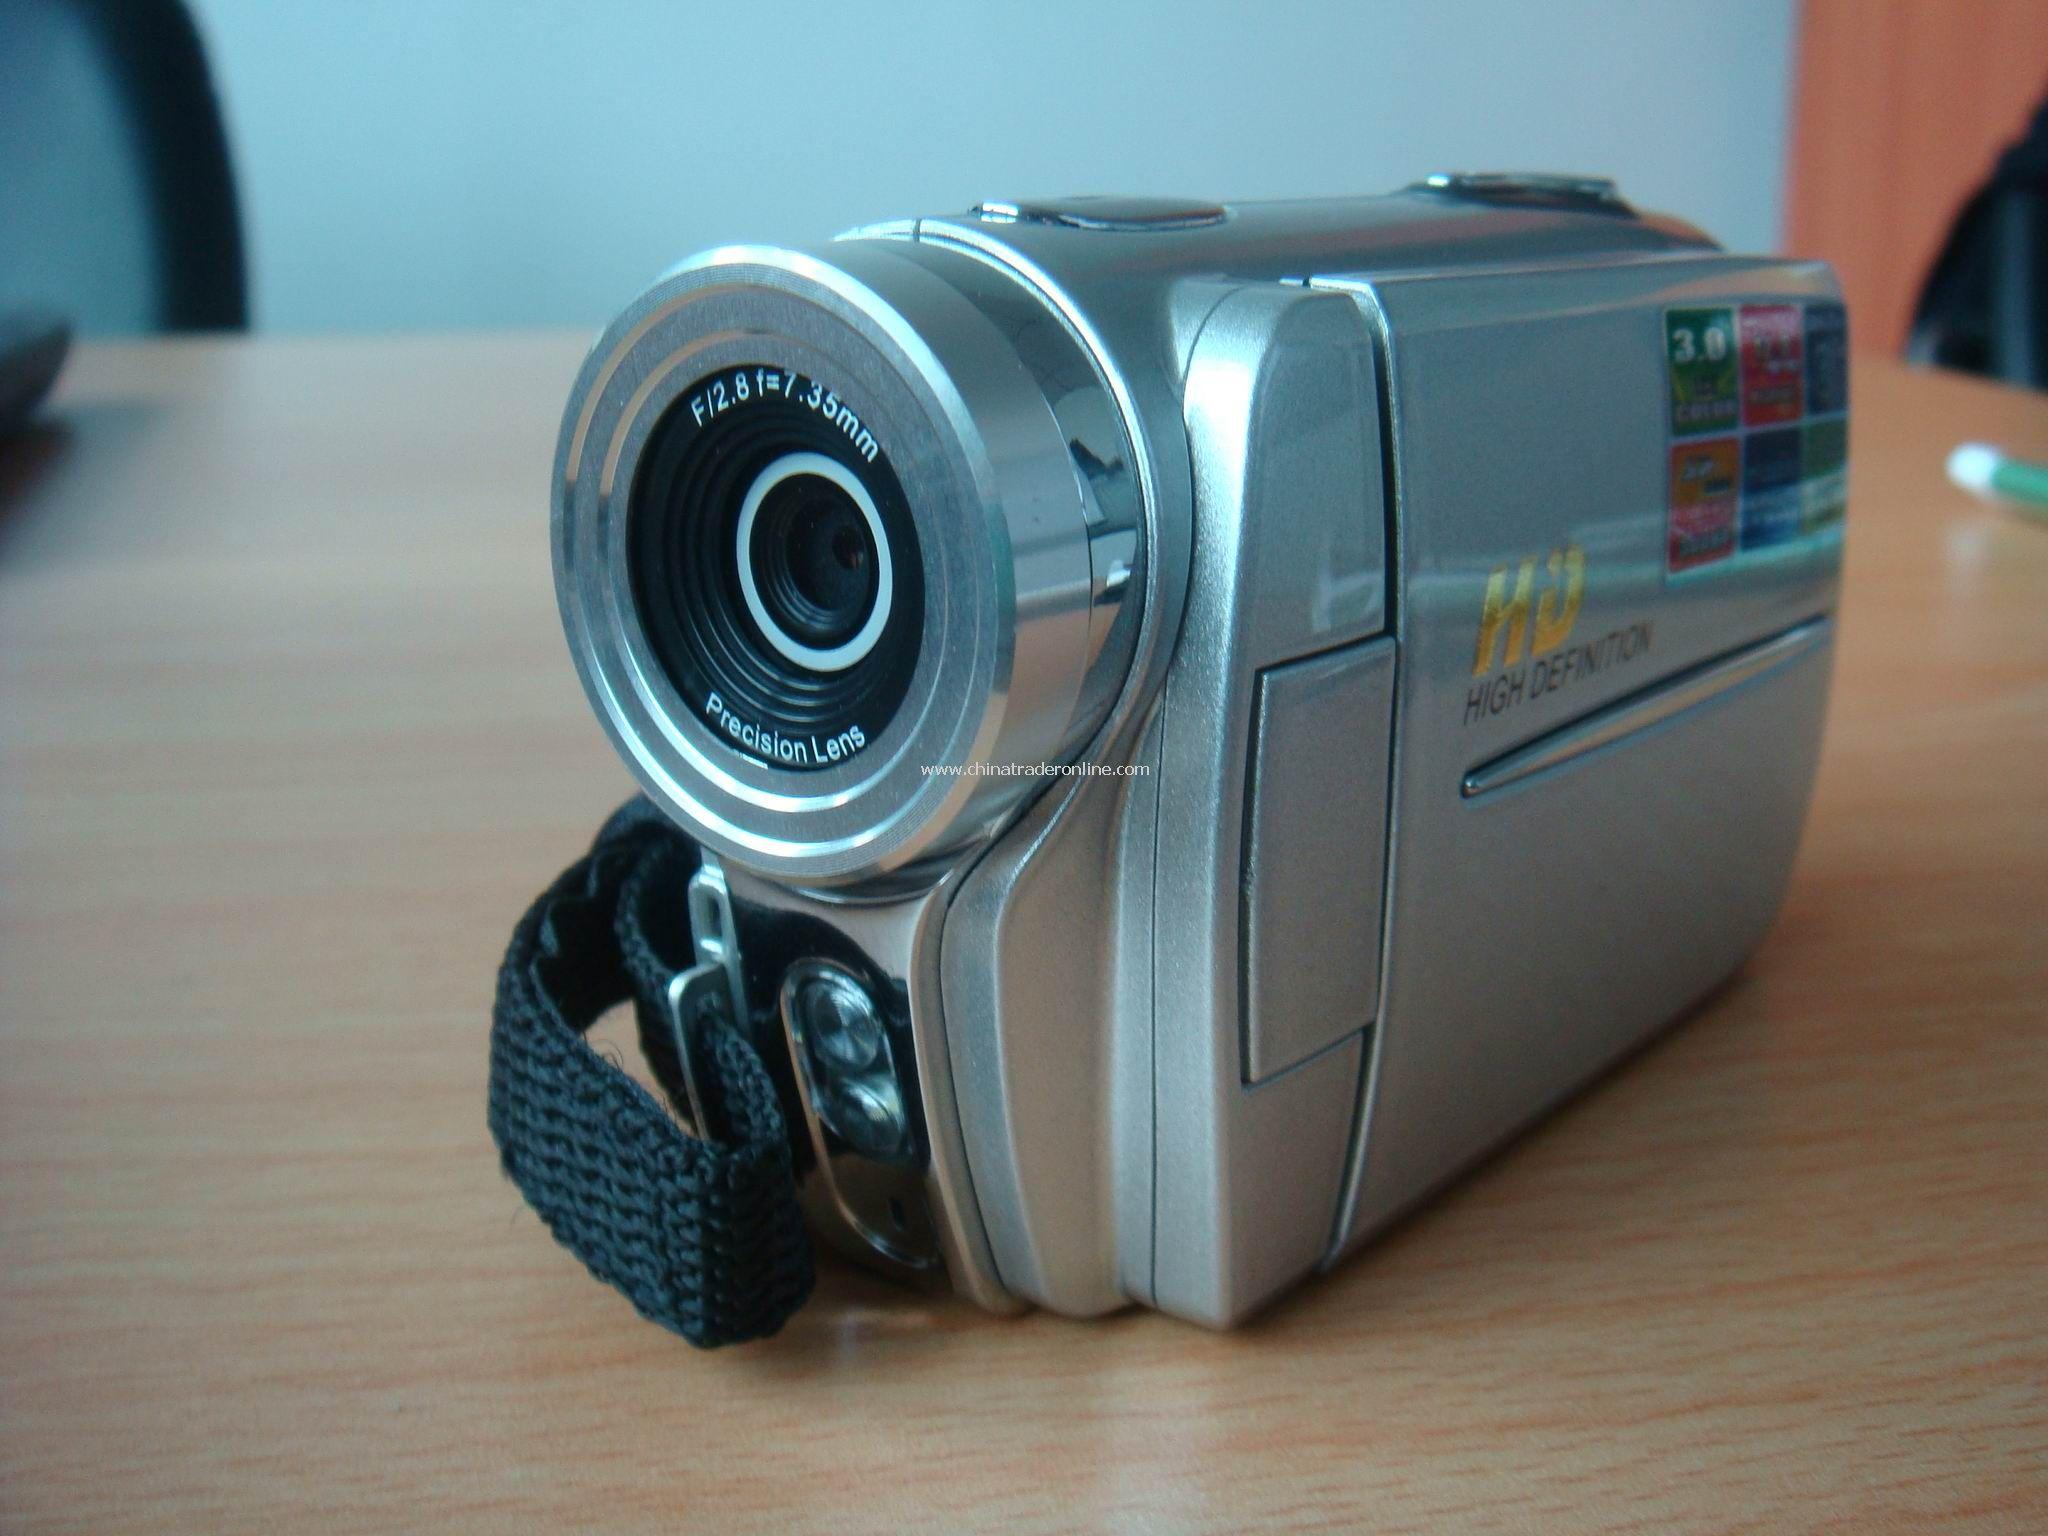 HD Digital Camera, 3.0-Inch TFT Display